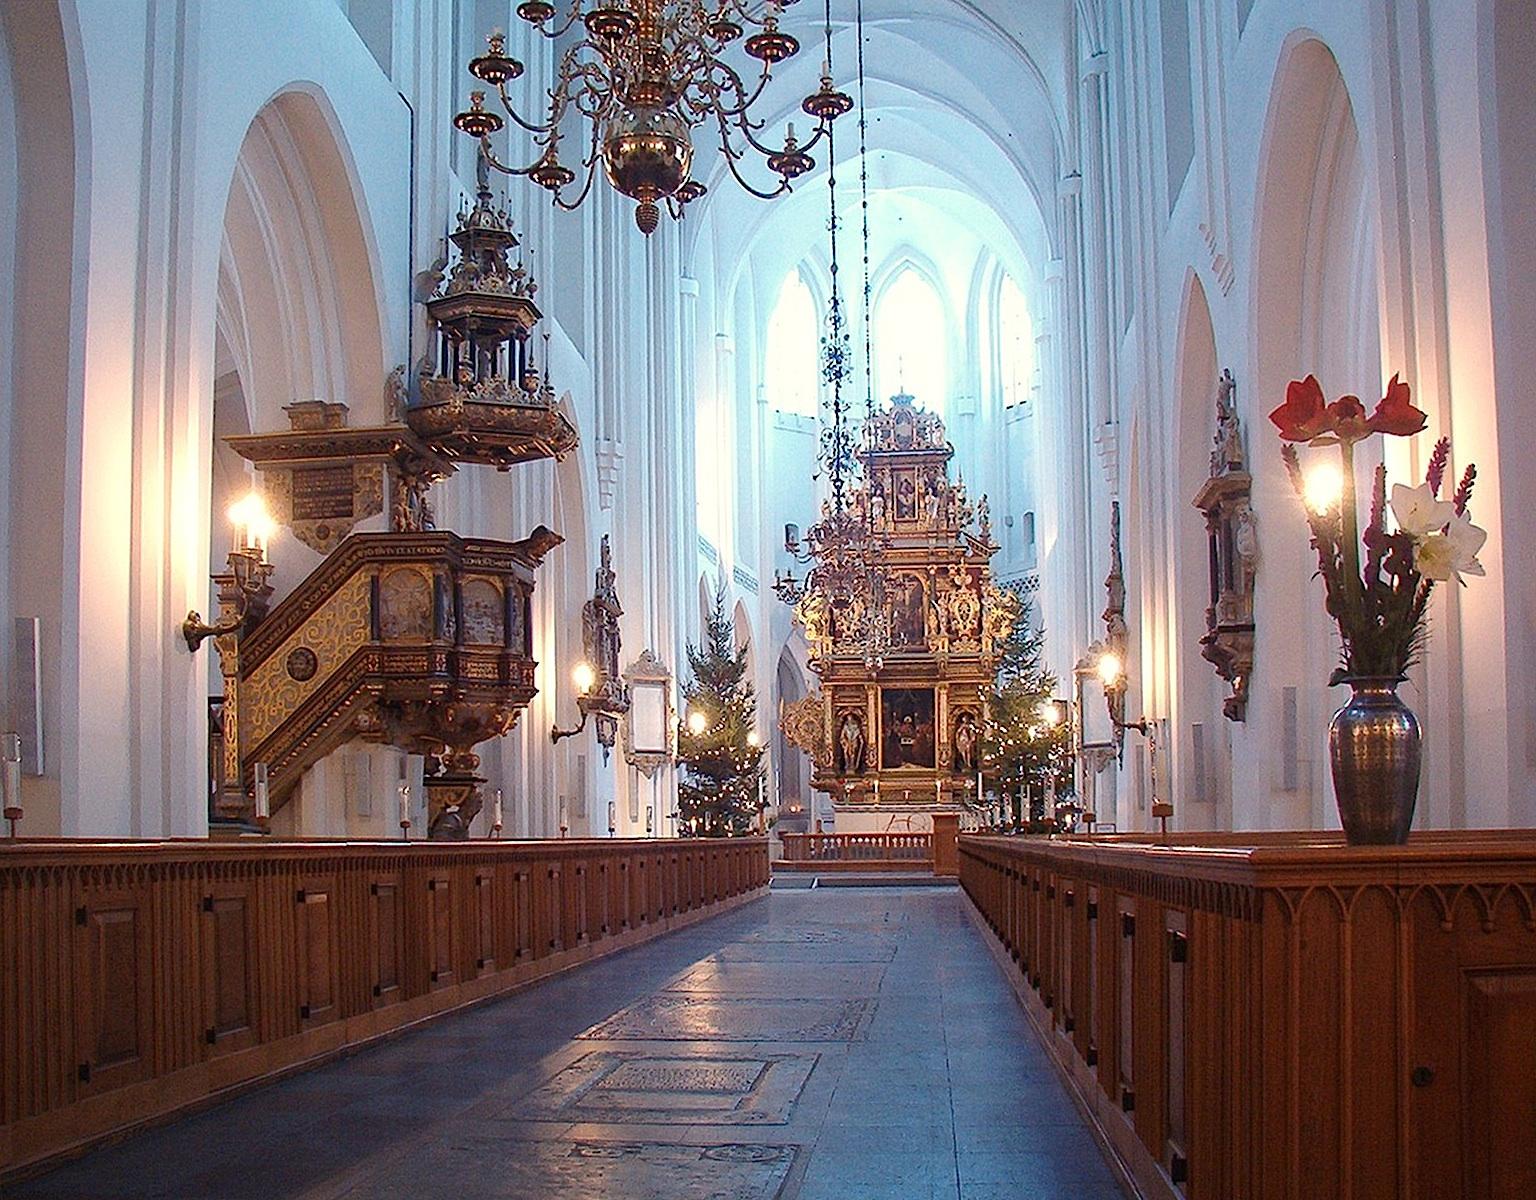 S:t Petri kyrka, Svenska kyrkan i Malm - Home | Facebook